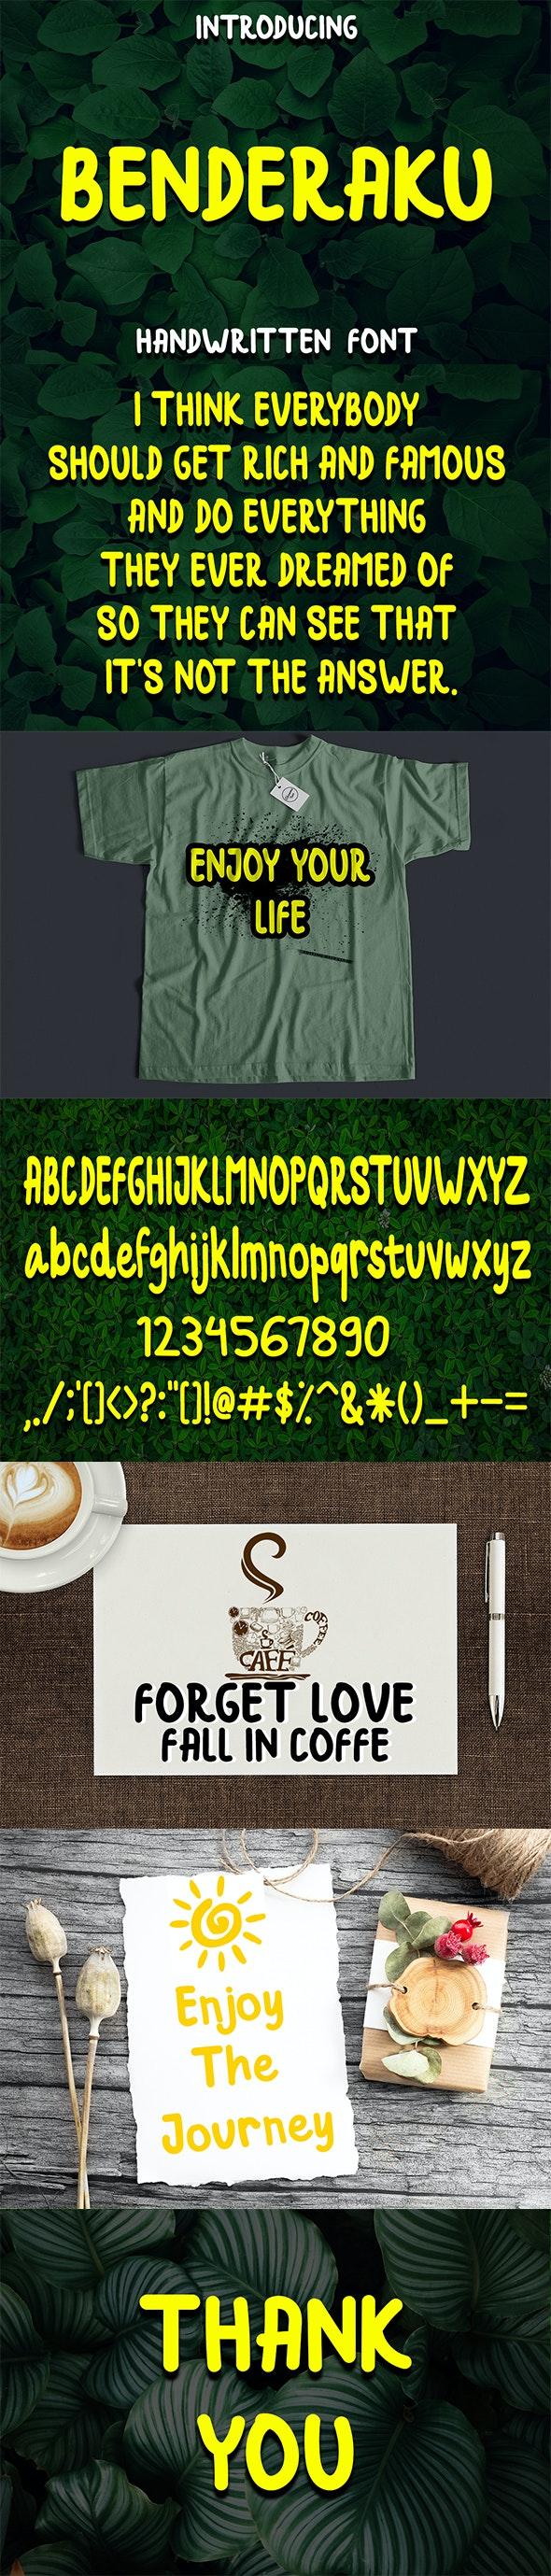 Benderaku Handwritten Font - Handwriting Fonts